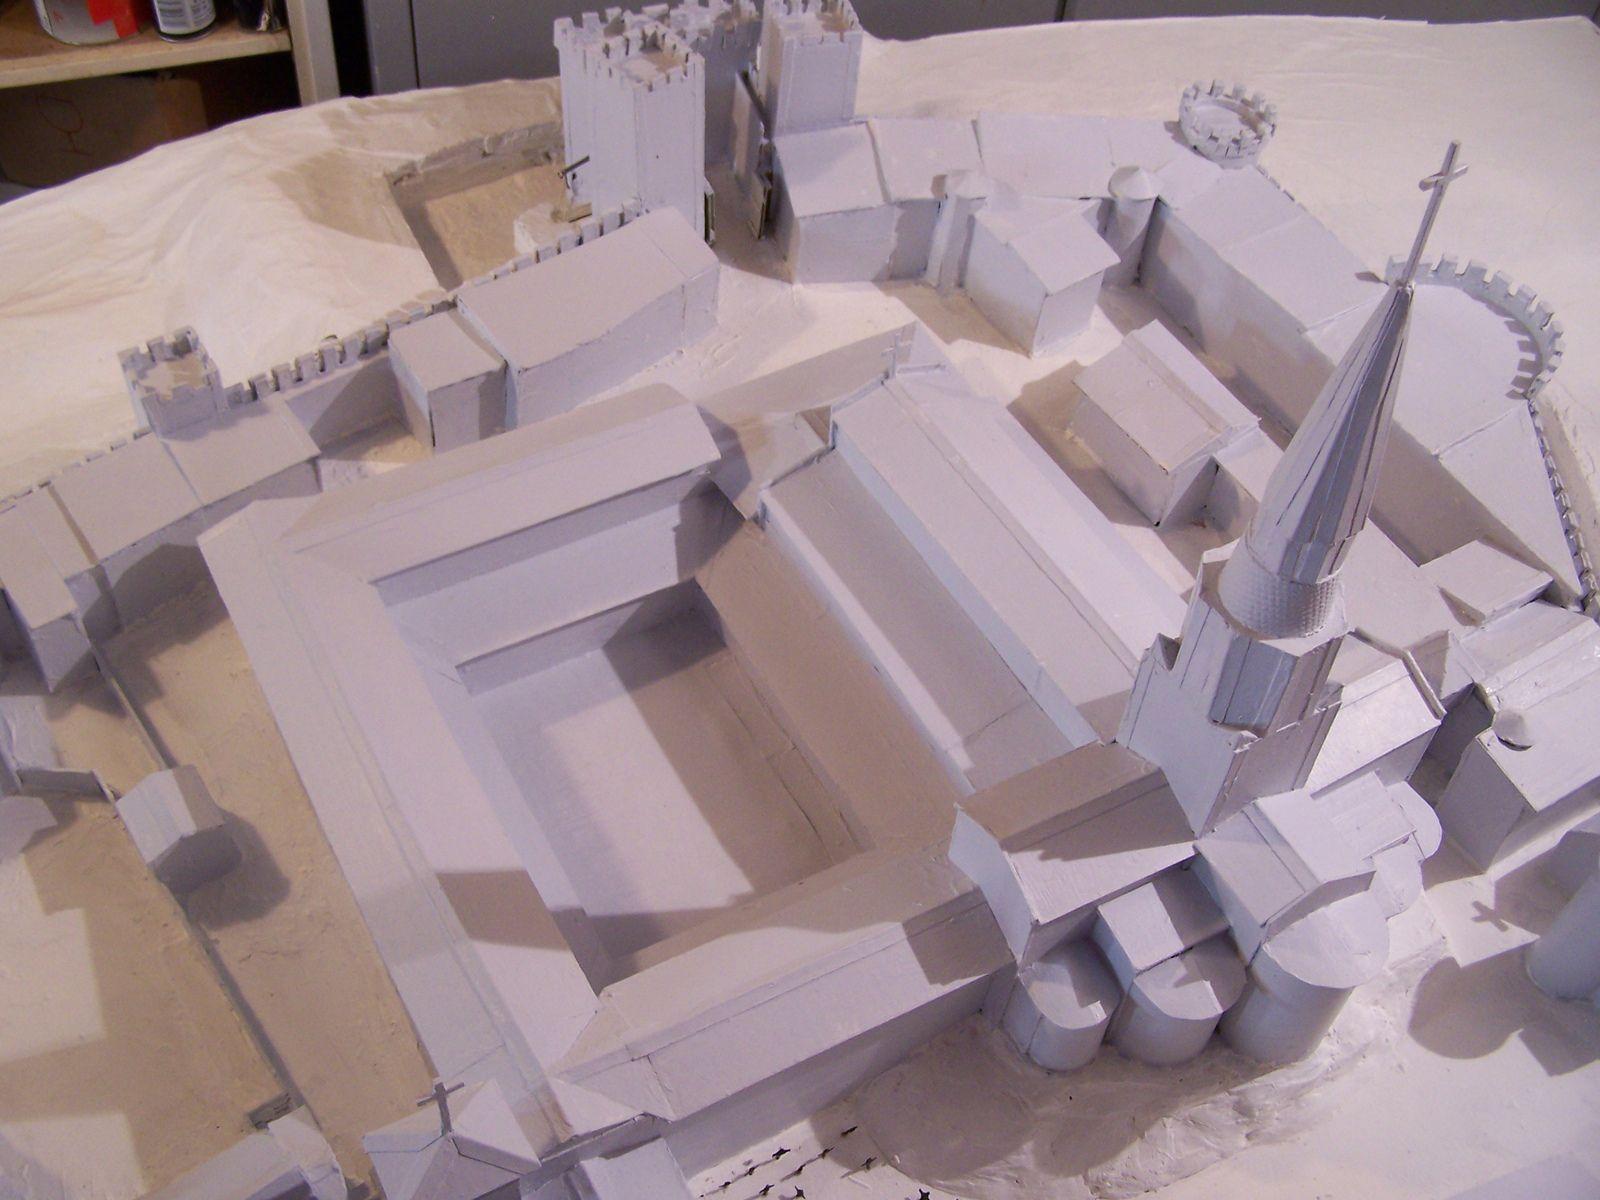 bientôt fini la maquette de l'abbaye de savigny